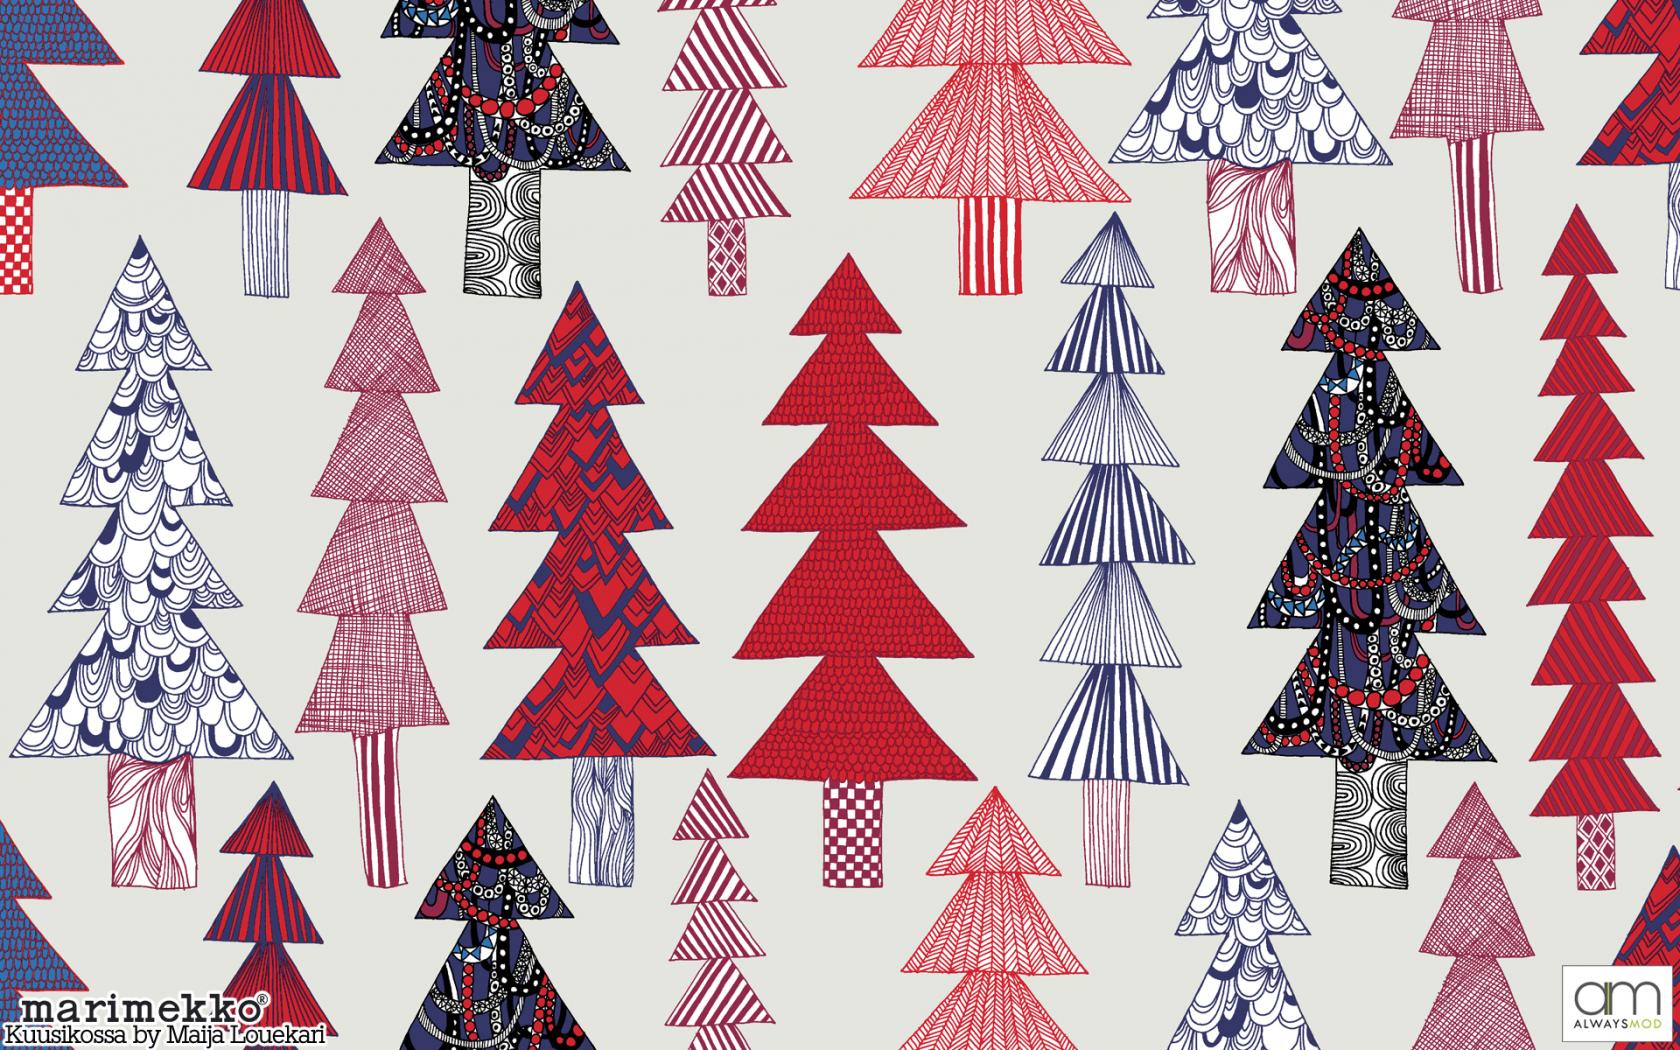 Free Download Marimekko Desktop Wallpapers Marimekko Design Ideas